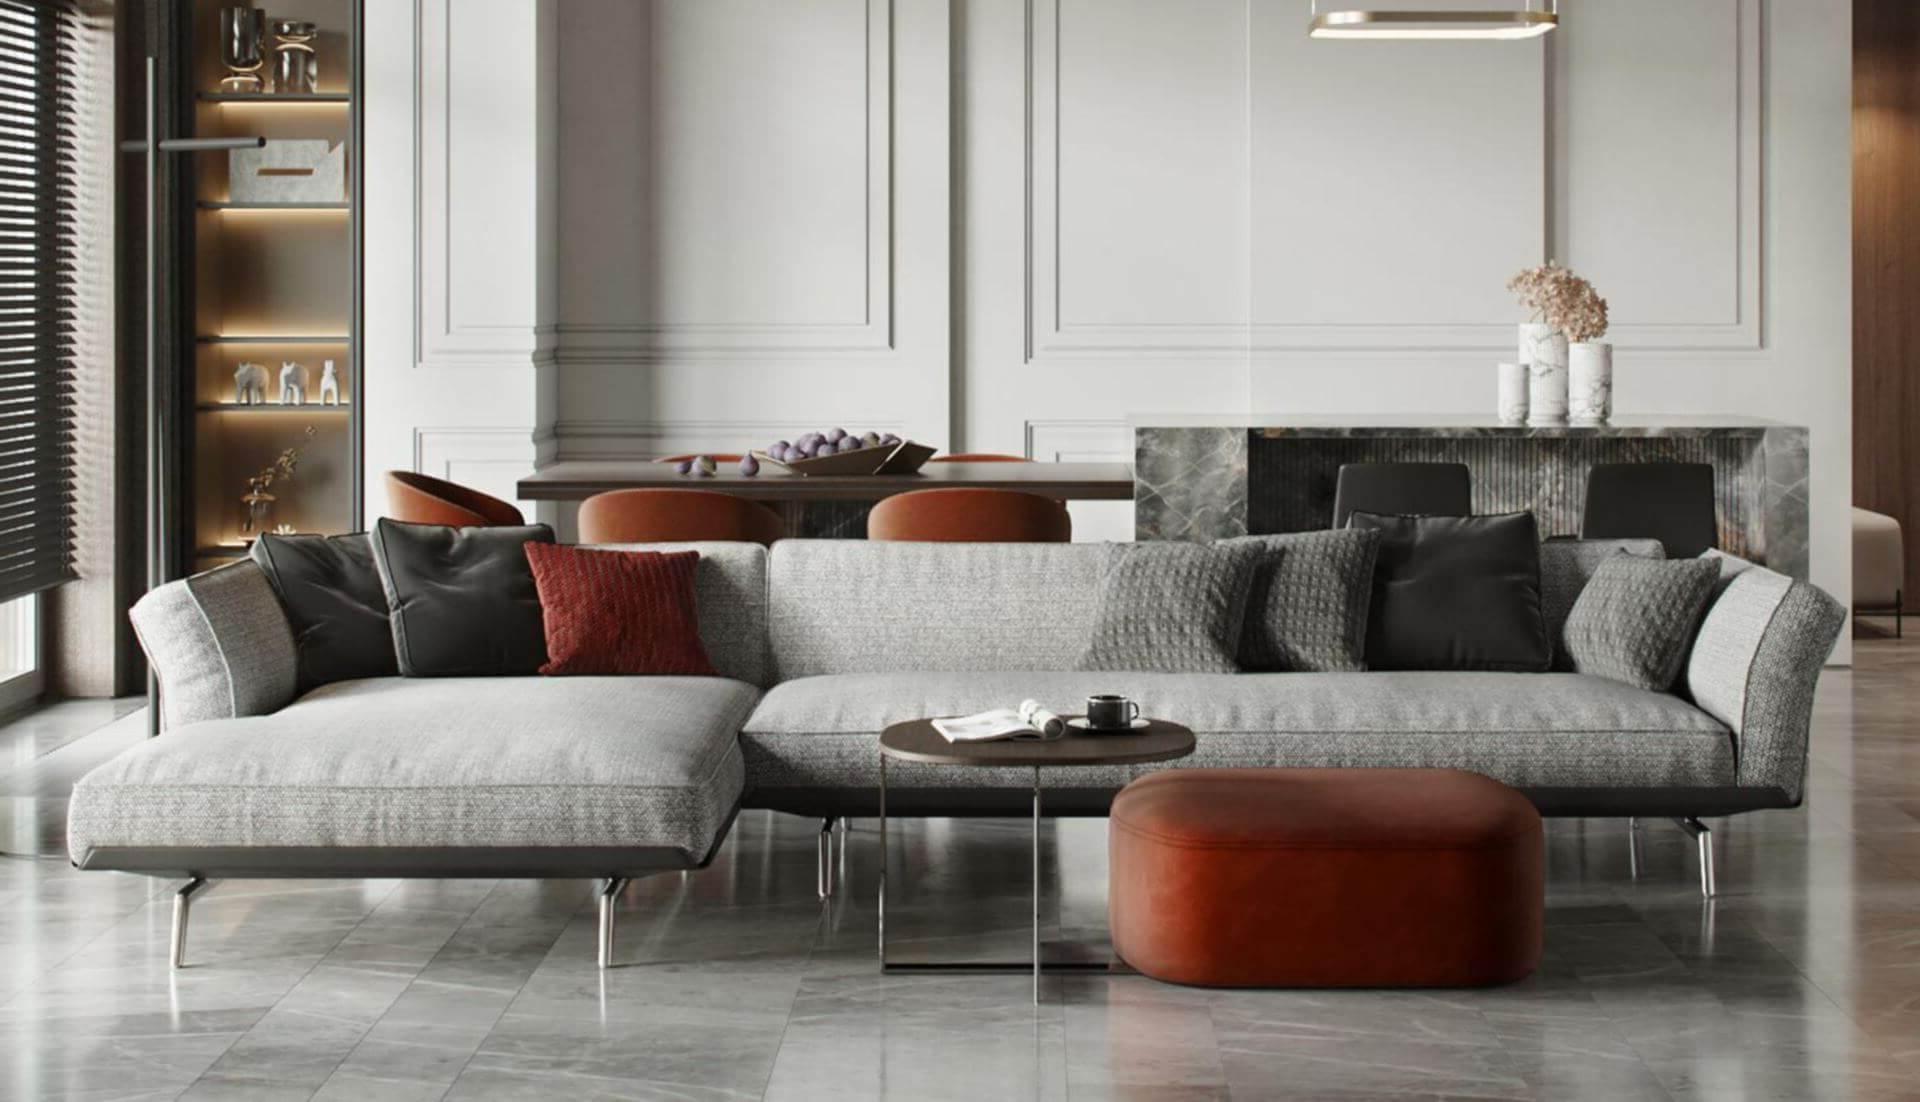 Most Current Flexform Este Modular Sofa – Dream Design Interiors Ltd In Dream Navy 3 Piece Modular Sofas (View 15 of 20)